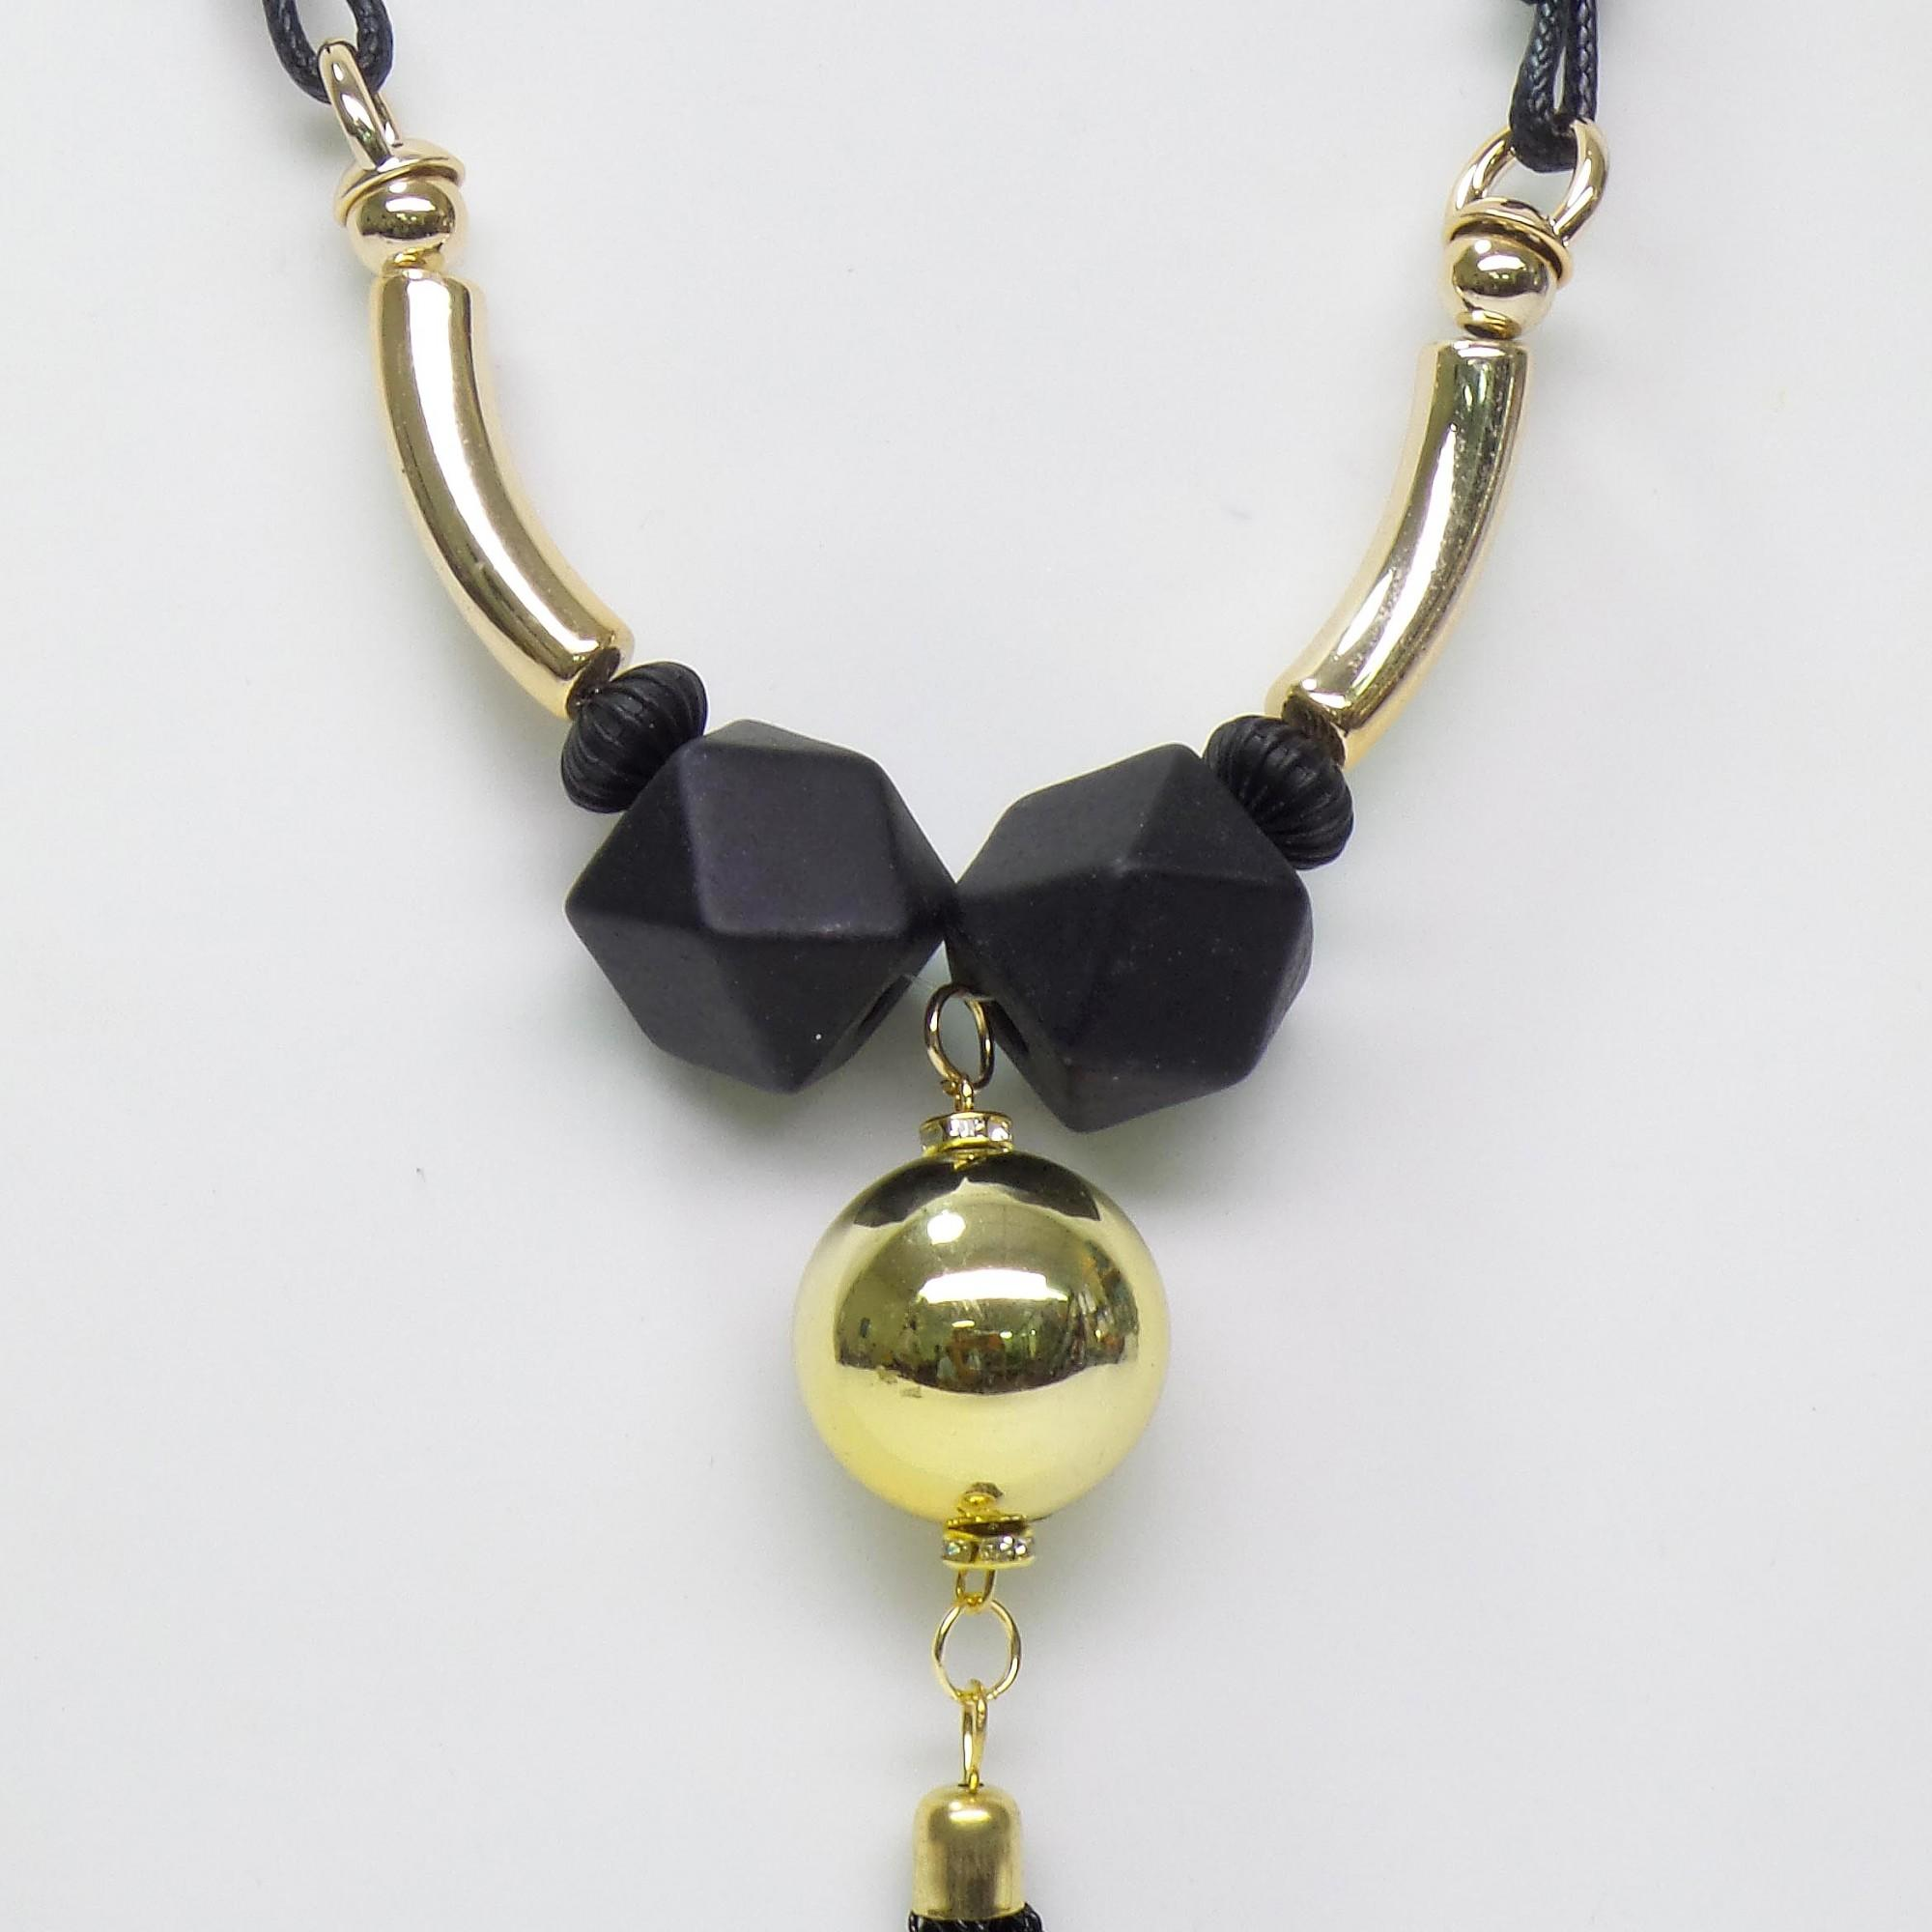 Detail Gambar OFASHION Aksesoris Kalung CA-180314-K003 Necklace Fashion Xuping Jewelry Hitam Hitam